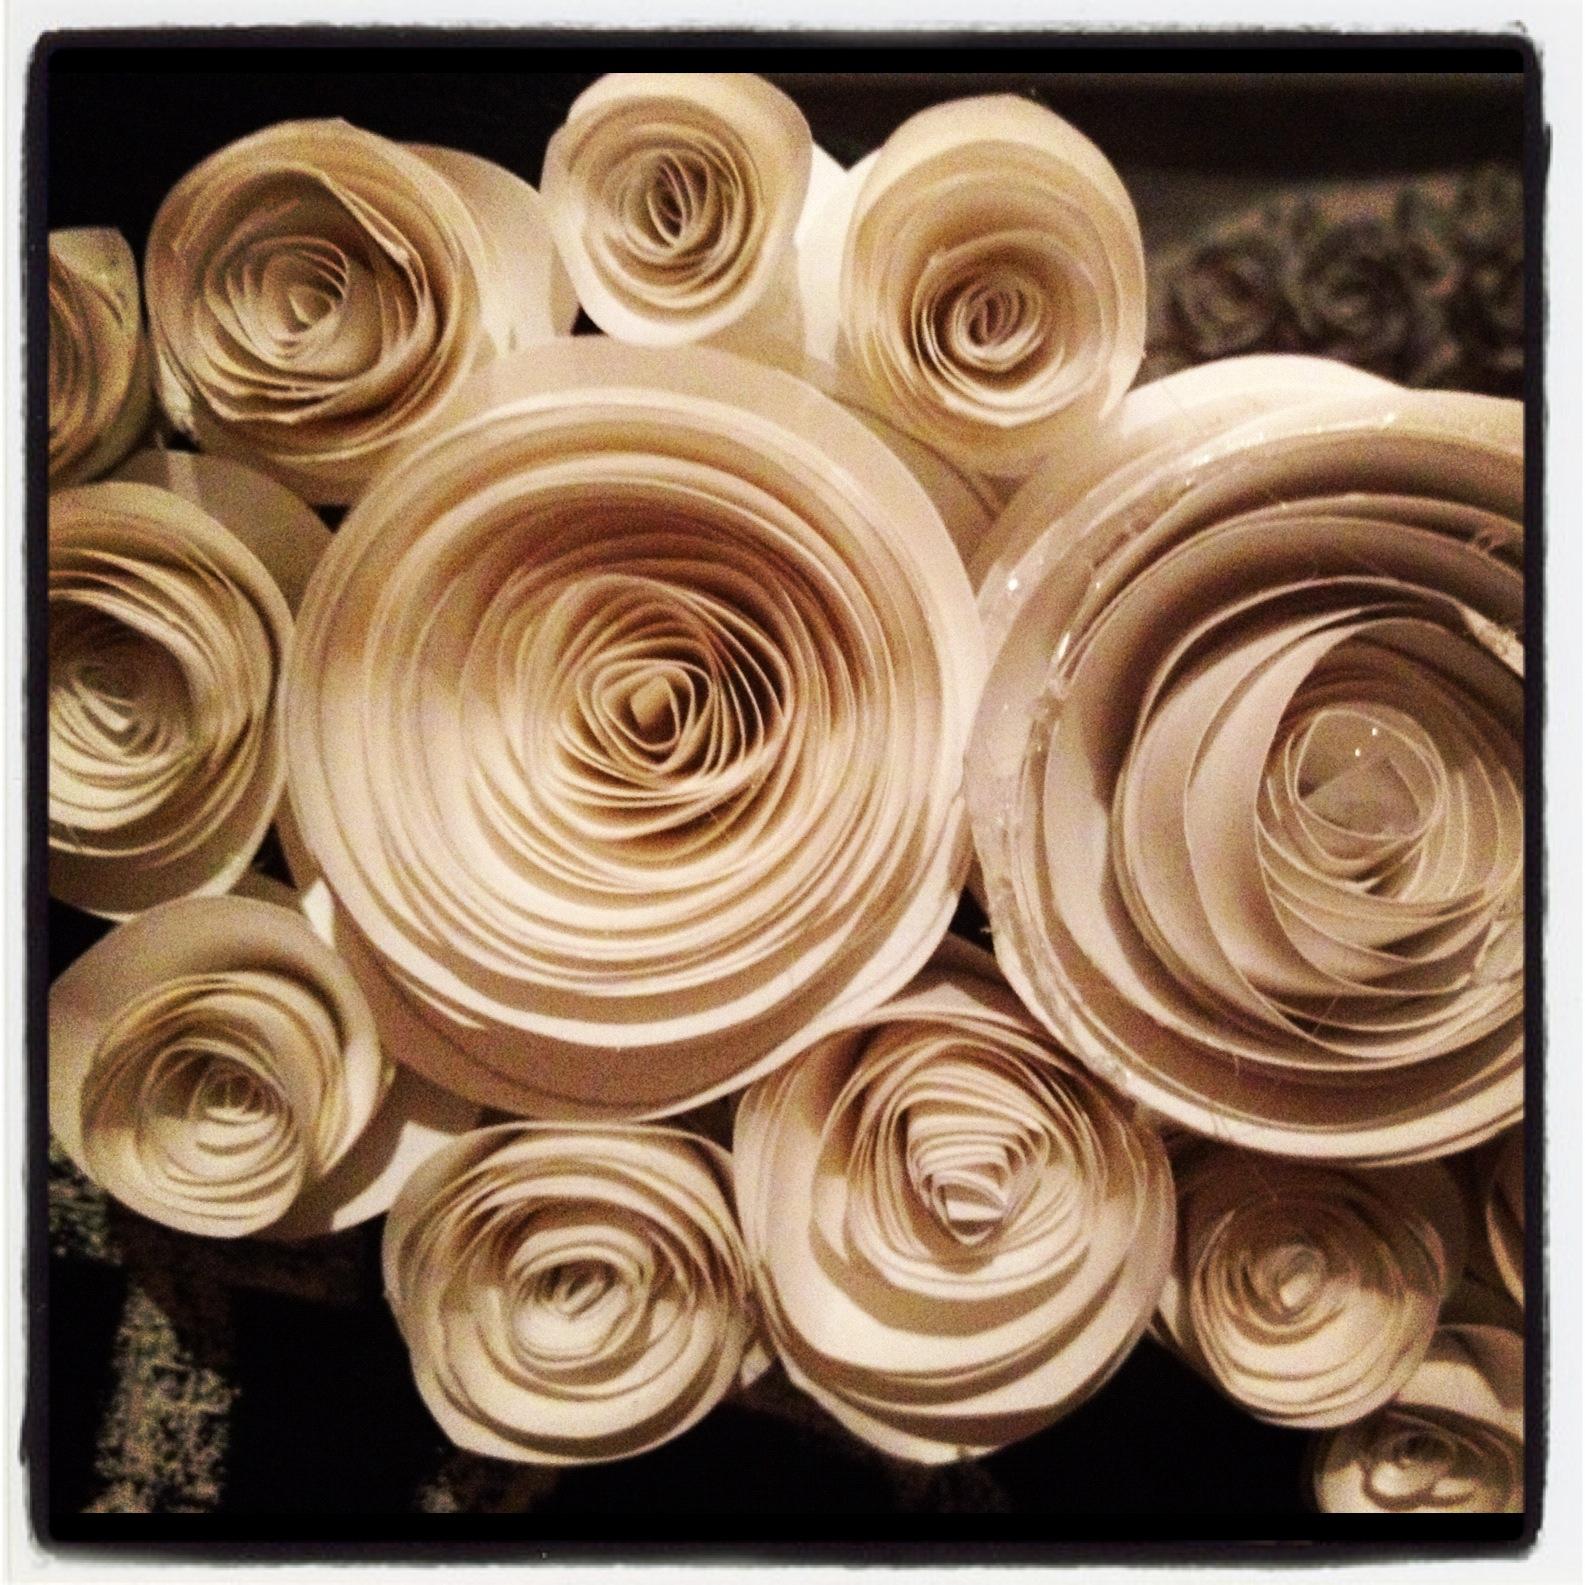 Pancakes Glue Guns Diy Swirl Paper Flowers